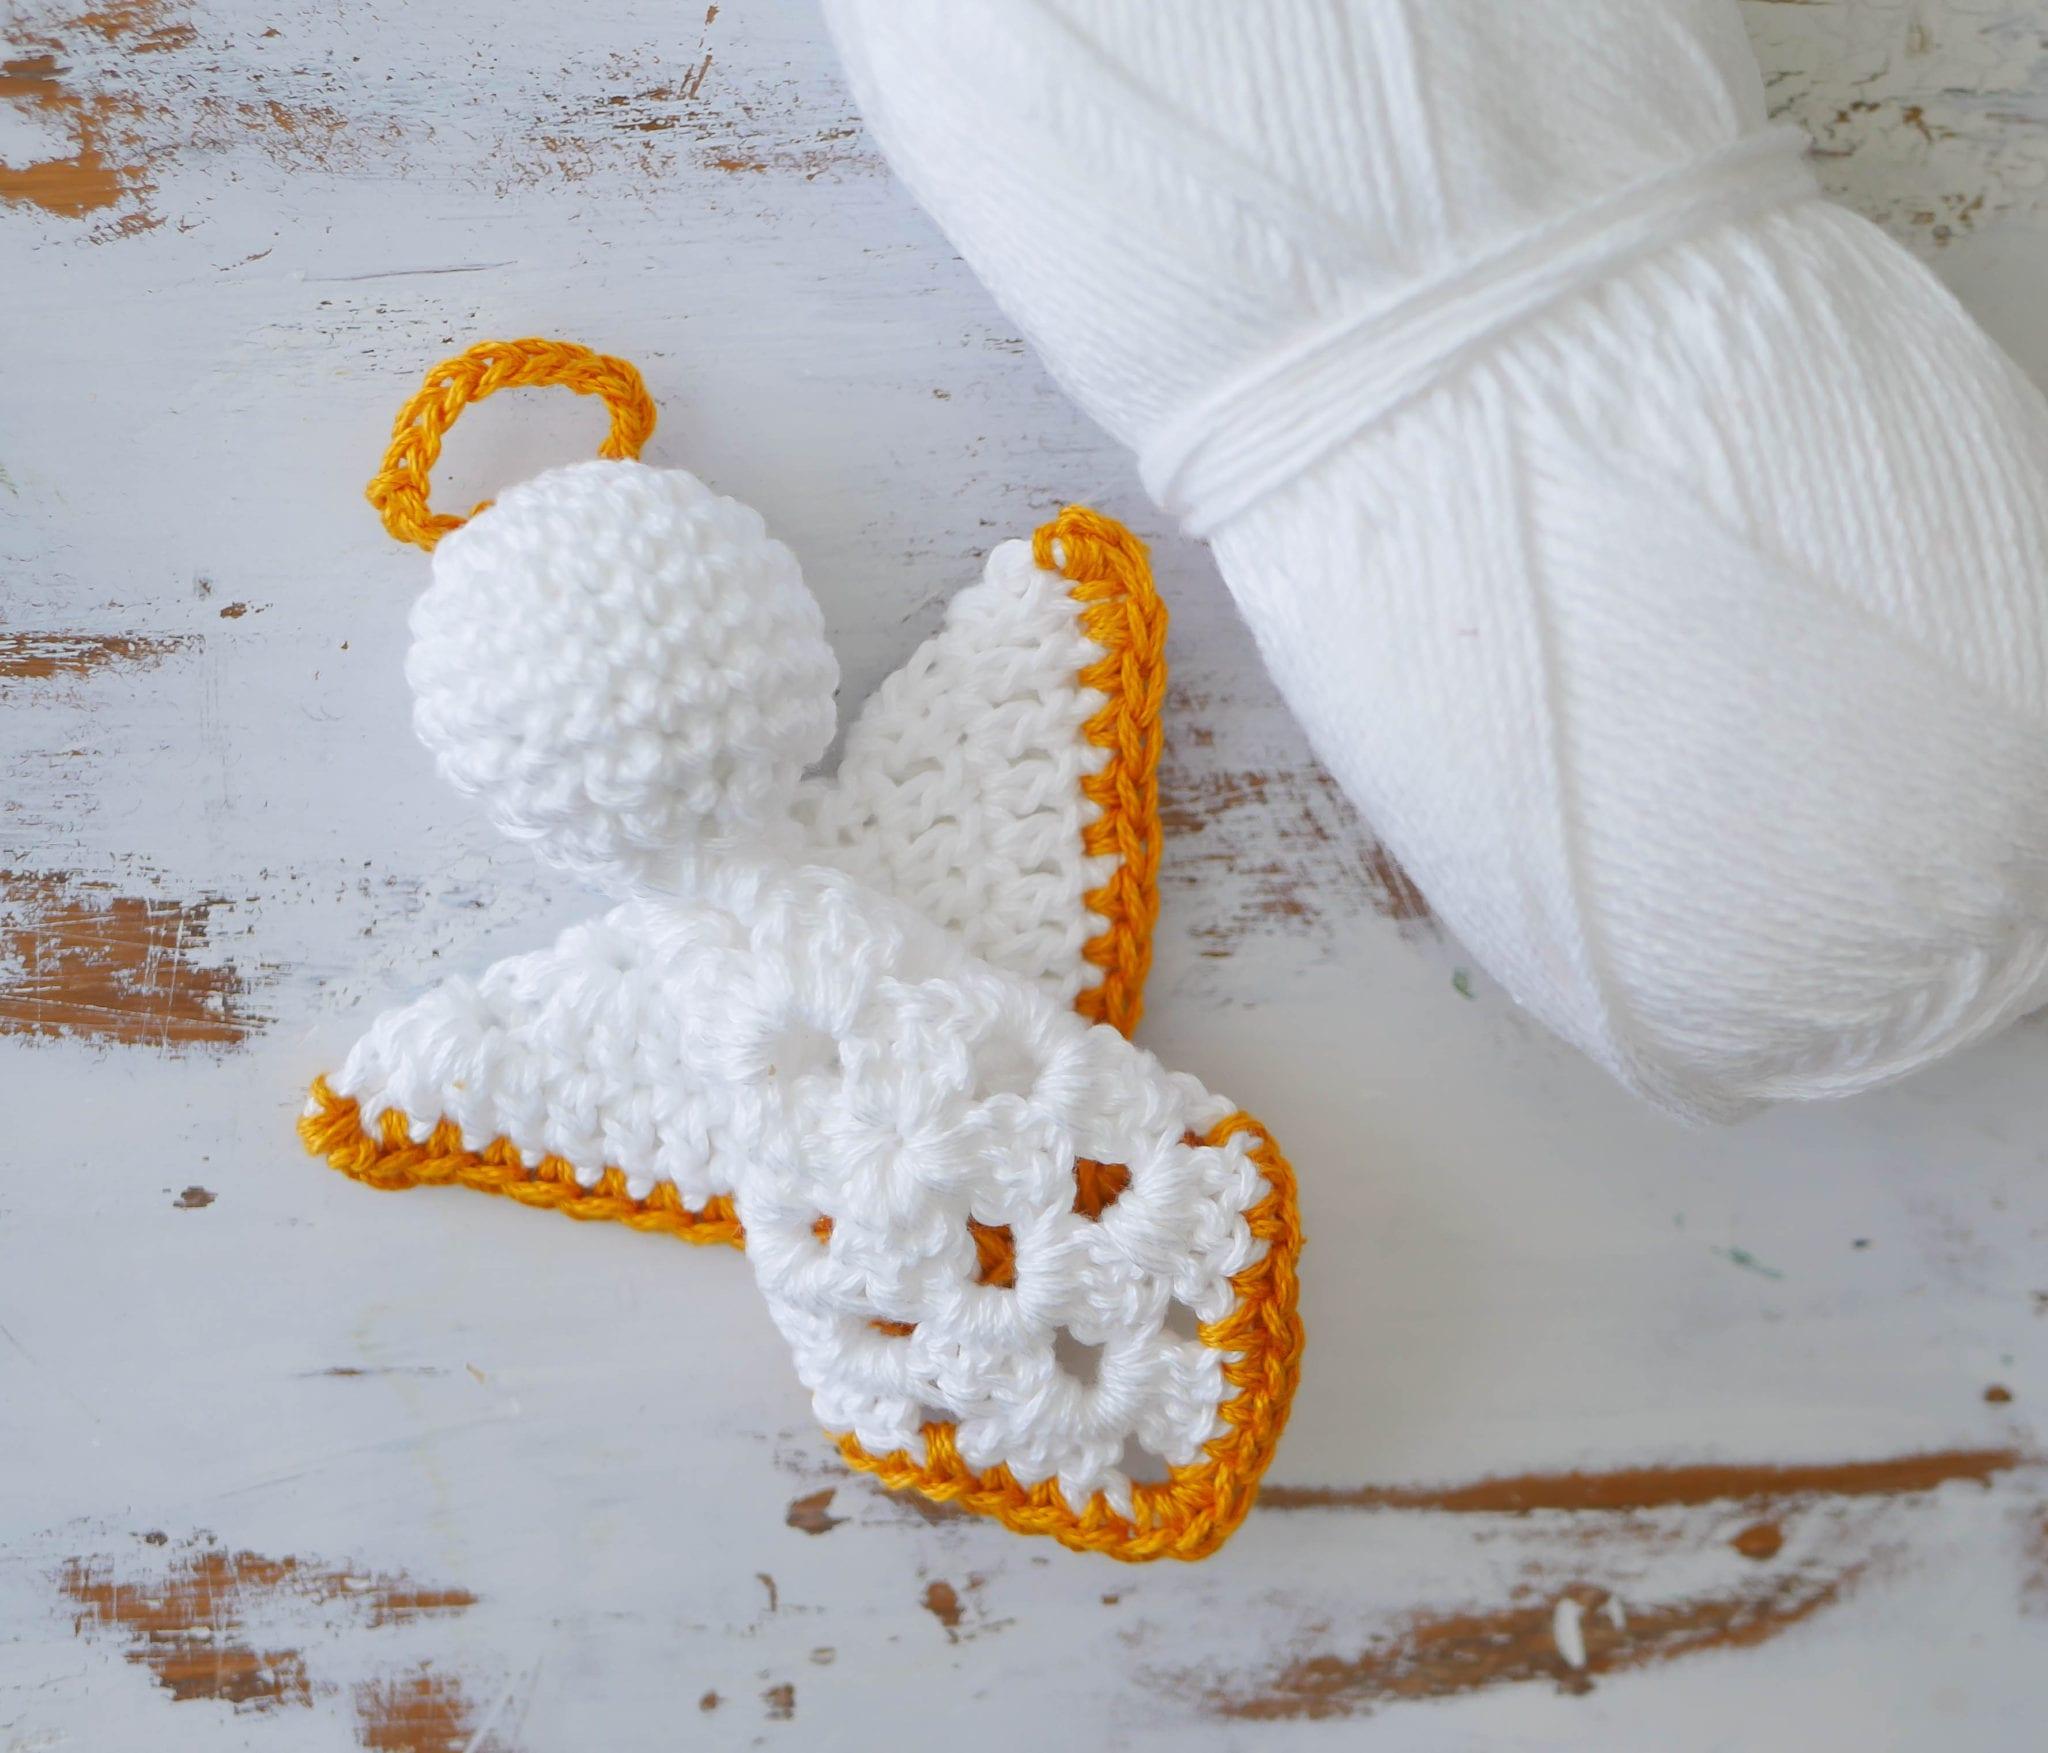 Crochet Granny Square Angel Christmas Ornament - Sewrella